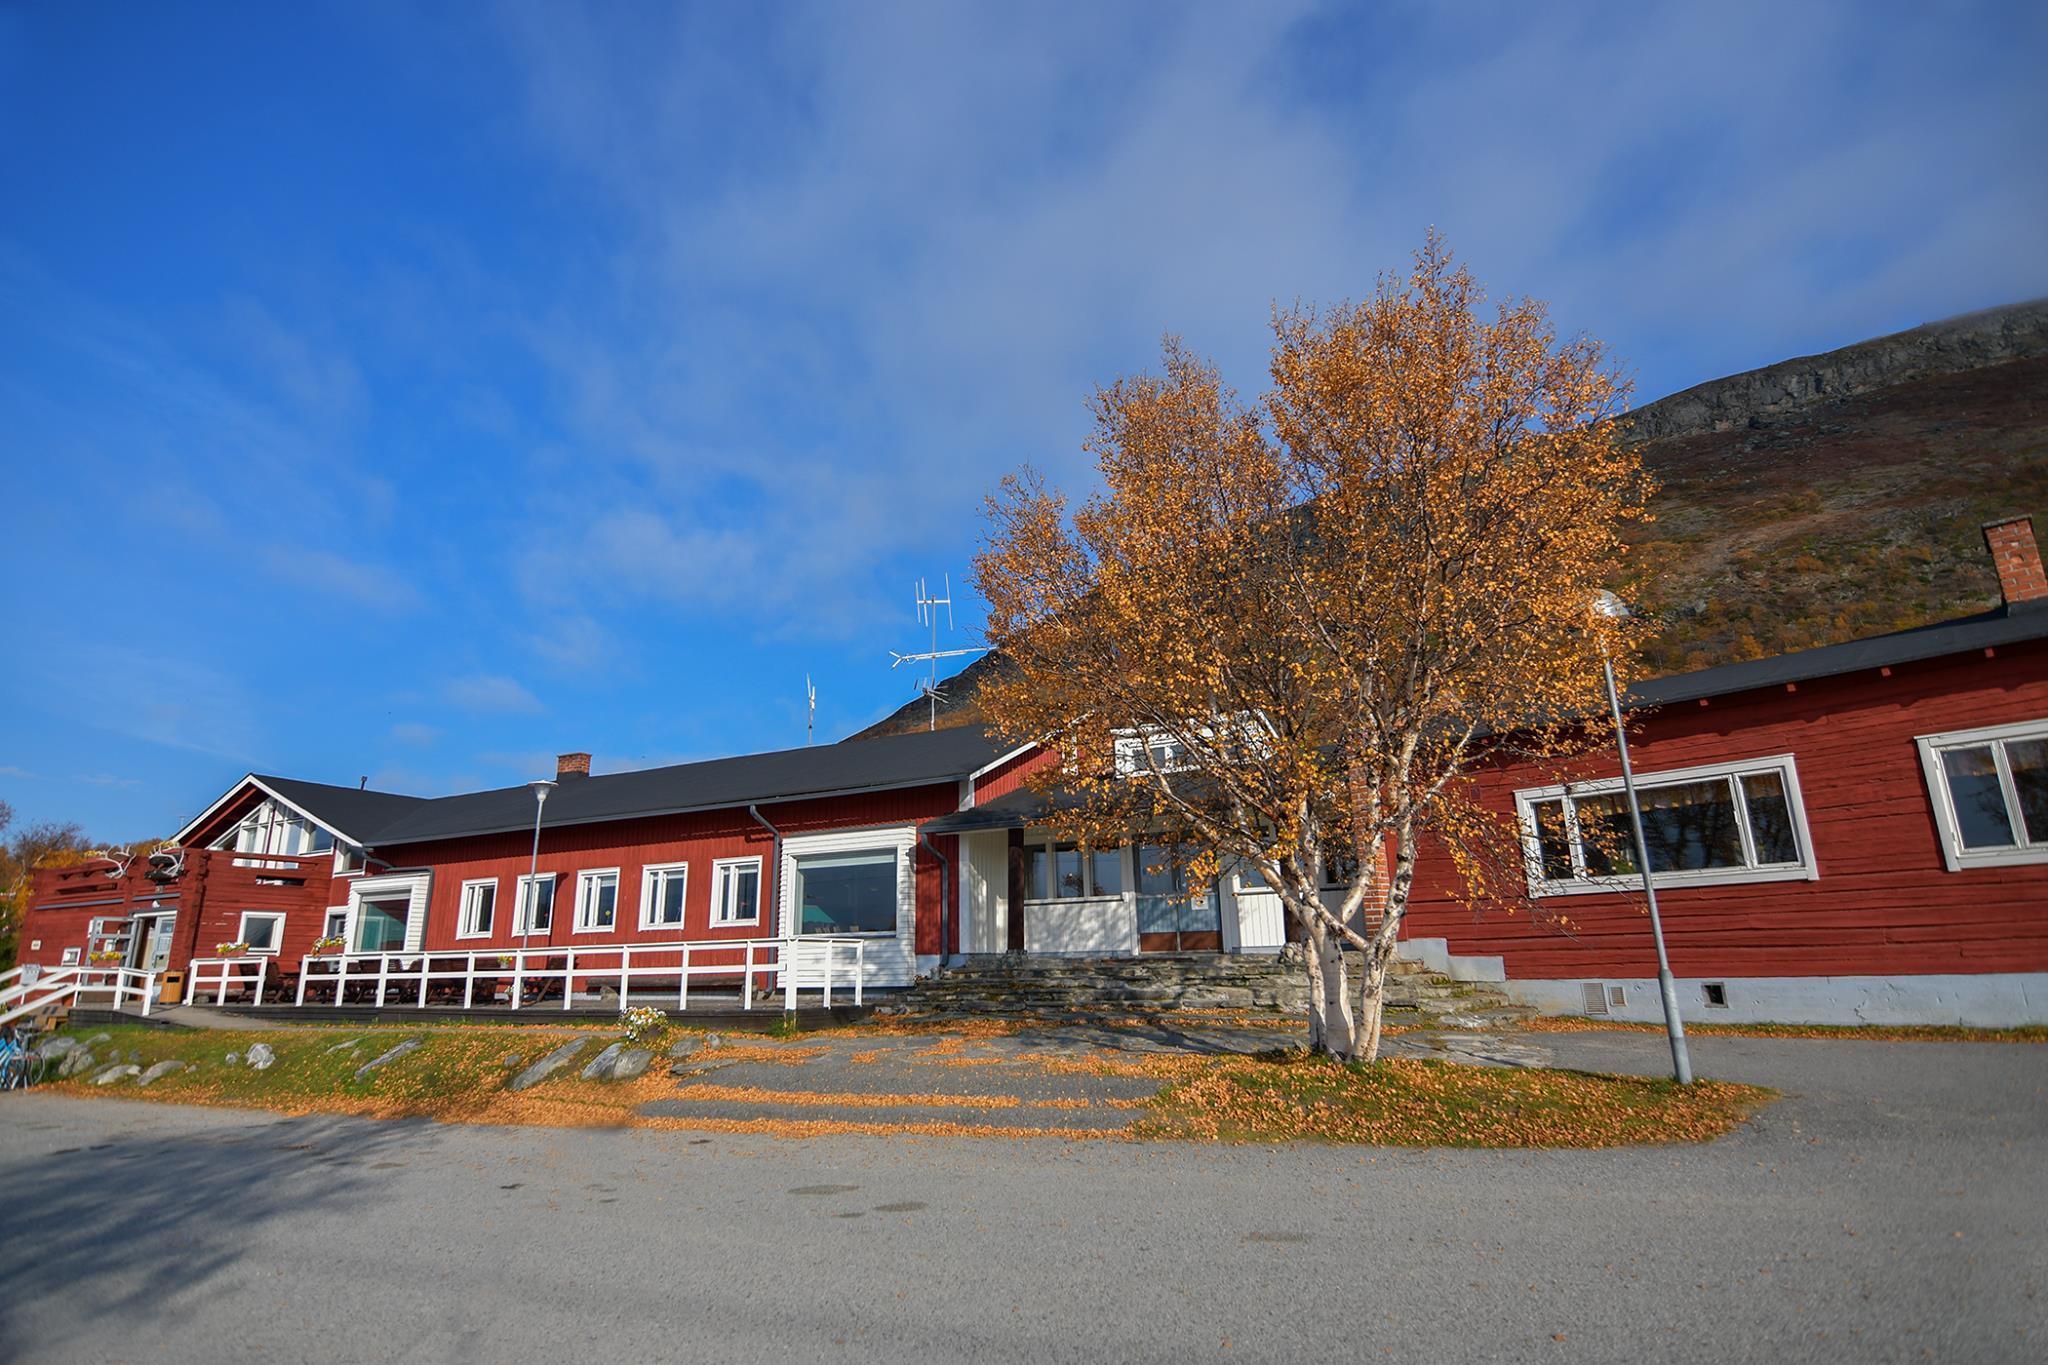 Kilpisjärvi Hiking Centre